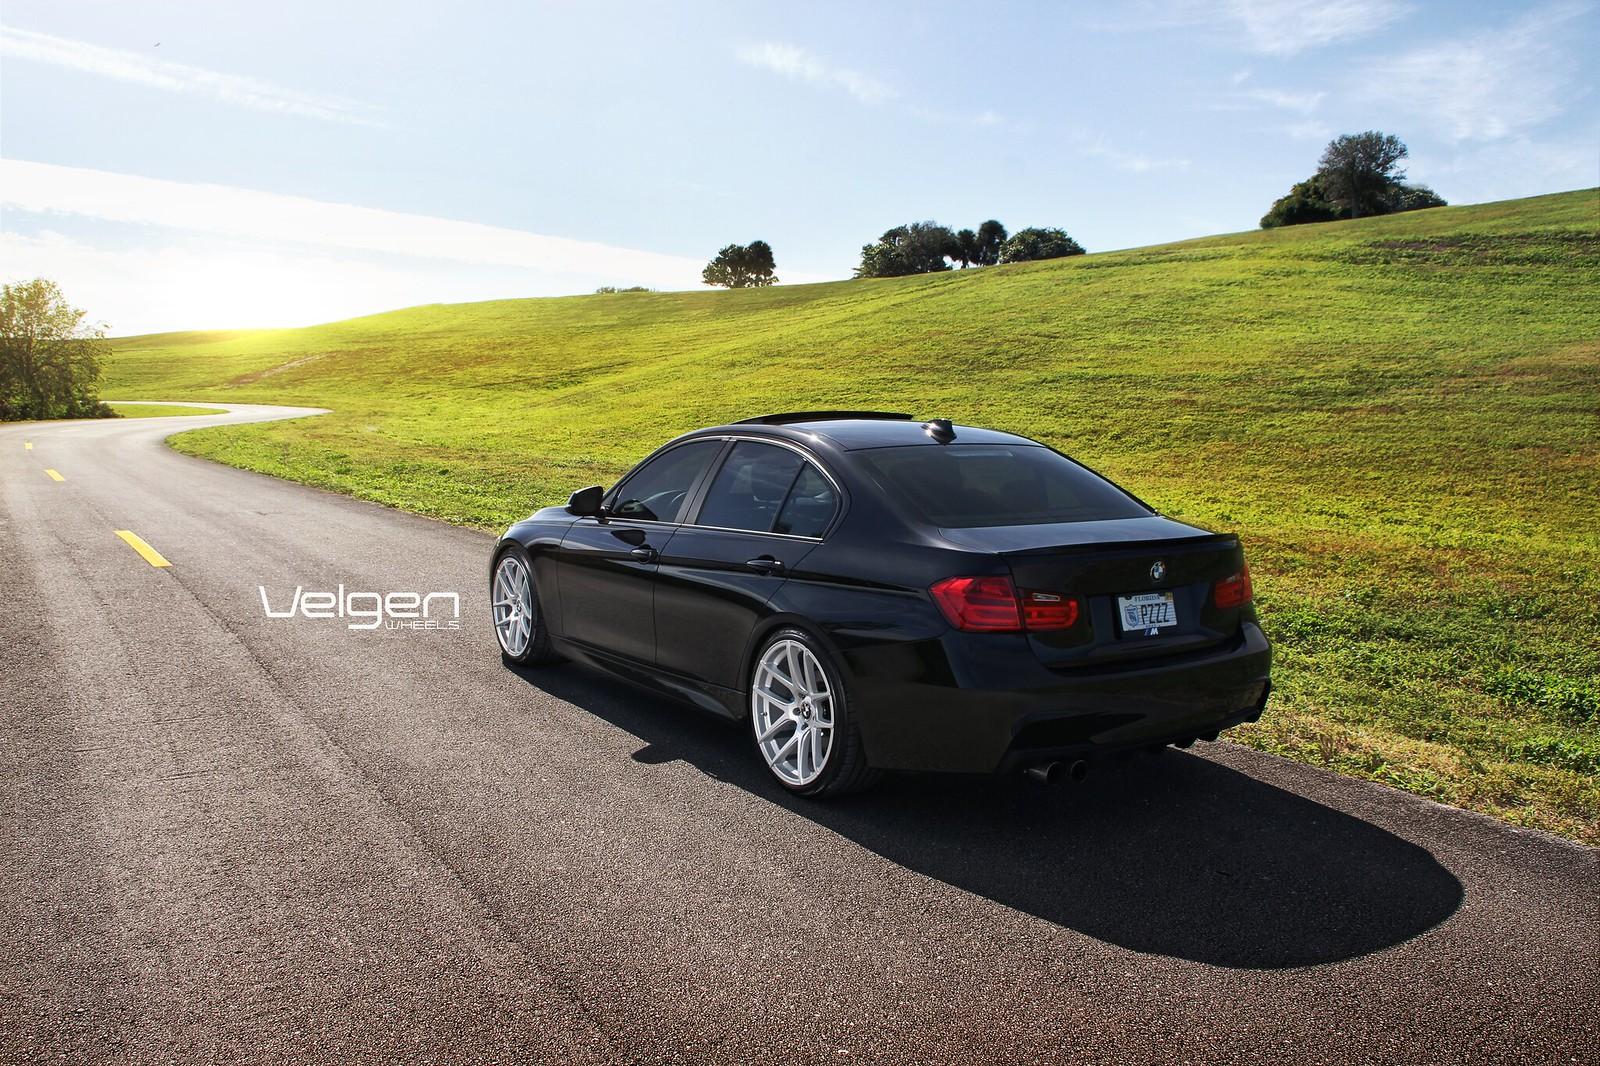 Black Bmw F30 Velgen Wheels Vmb5 Clublexus Lexus Forum